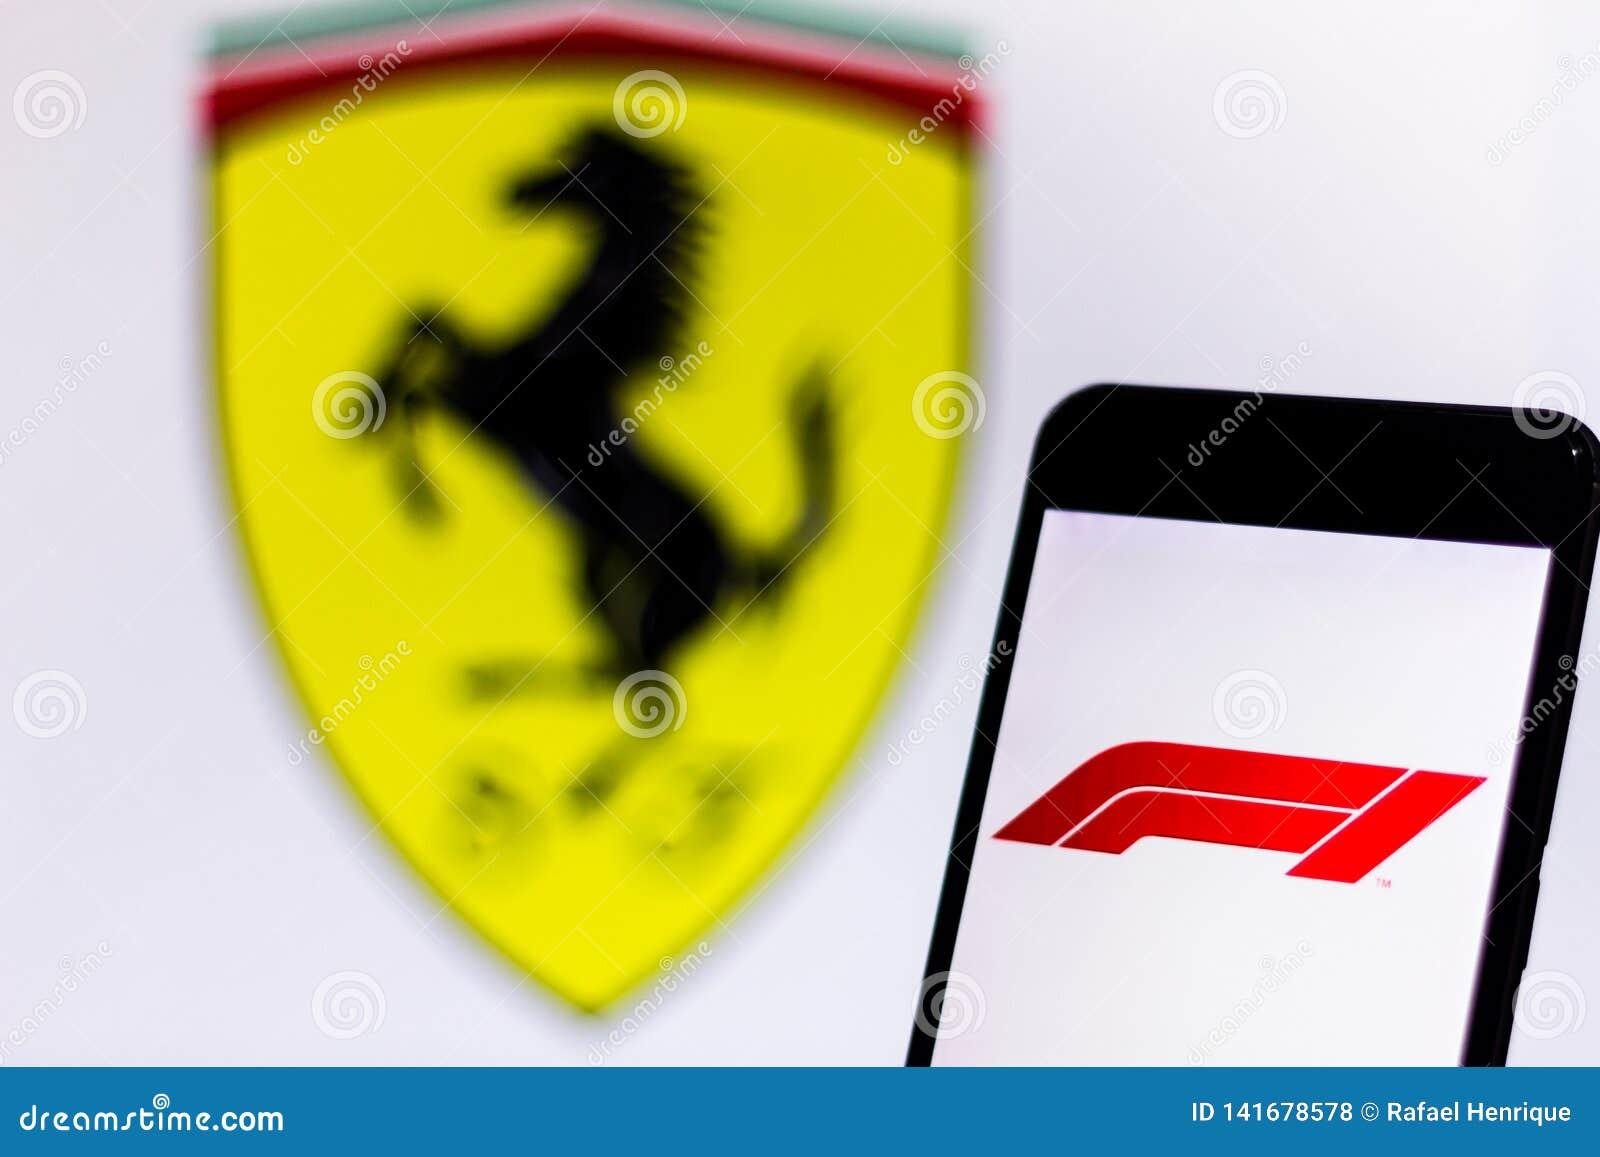 Official F1 Fia Formula 1 Logo On The Mobile Device Screen Logo Of The Scuderia Ferrari Mission Winnow Team In The Background Editorial Stock Photo Image Of Ferrari Logo 141678578